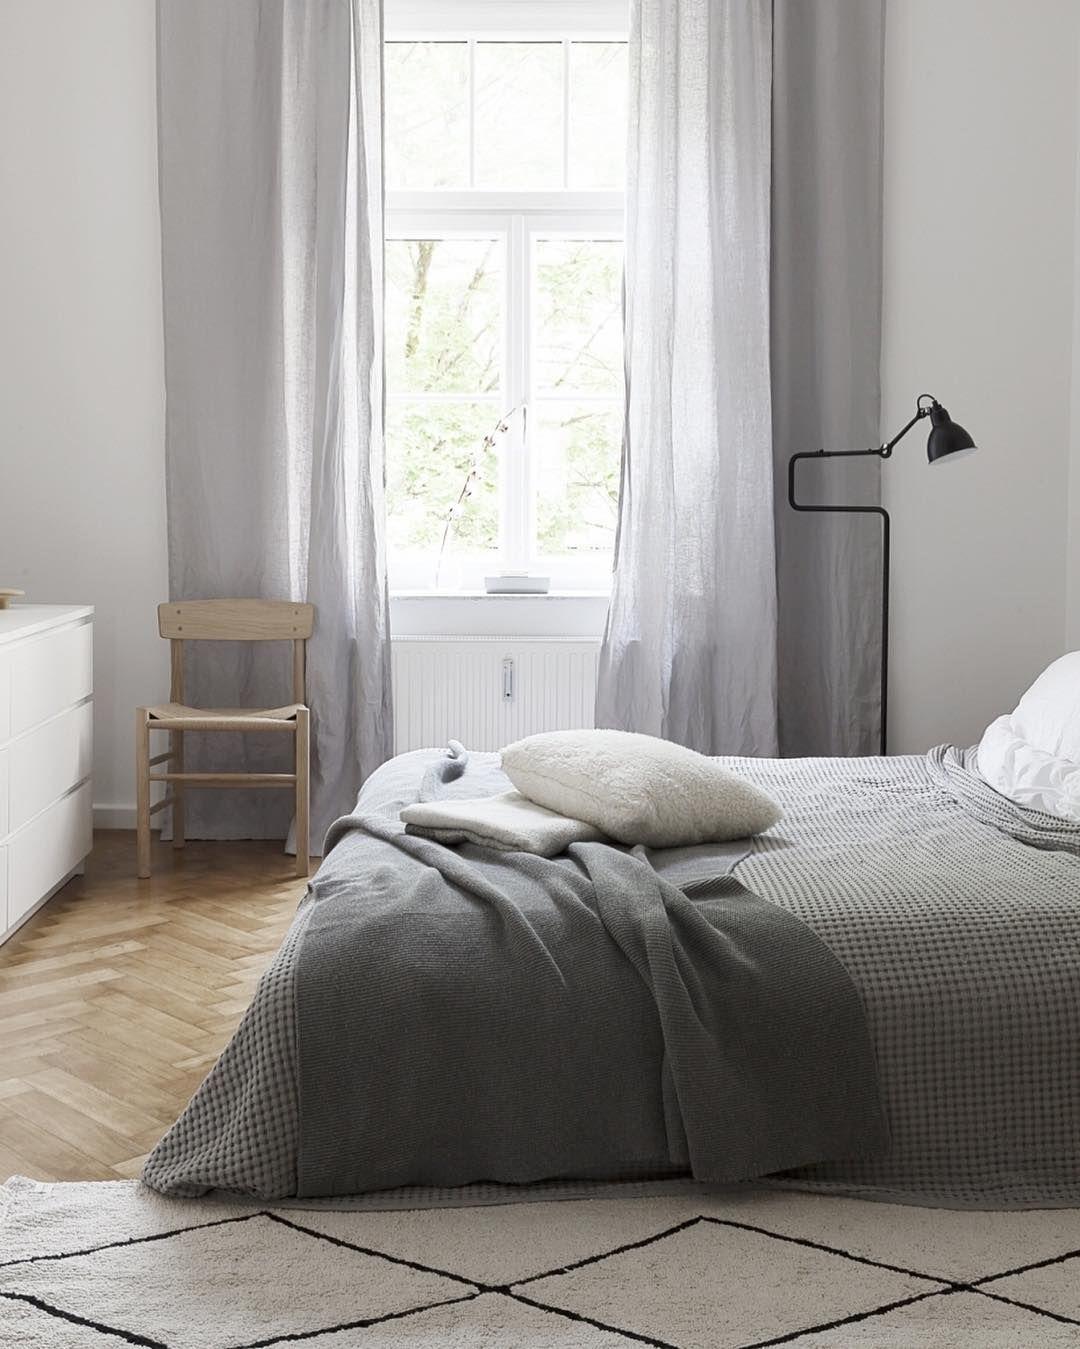 15 Trucchi Per Una Stanza Piu Grande 53 9k Followers 1 453 Following 1 693 Posts See Instagram Photos And Videos From Sarah Van Peteghe Bedroom Interior Bedroom Design Minimalist Home Interior